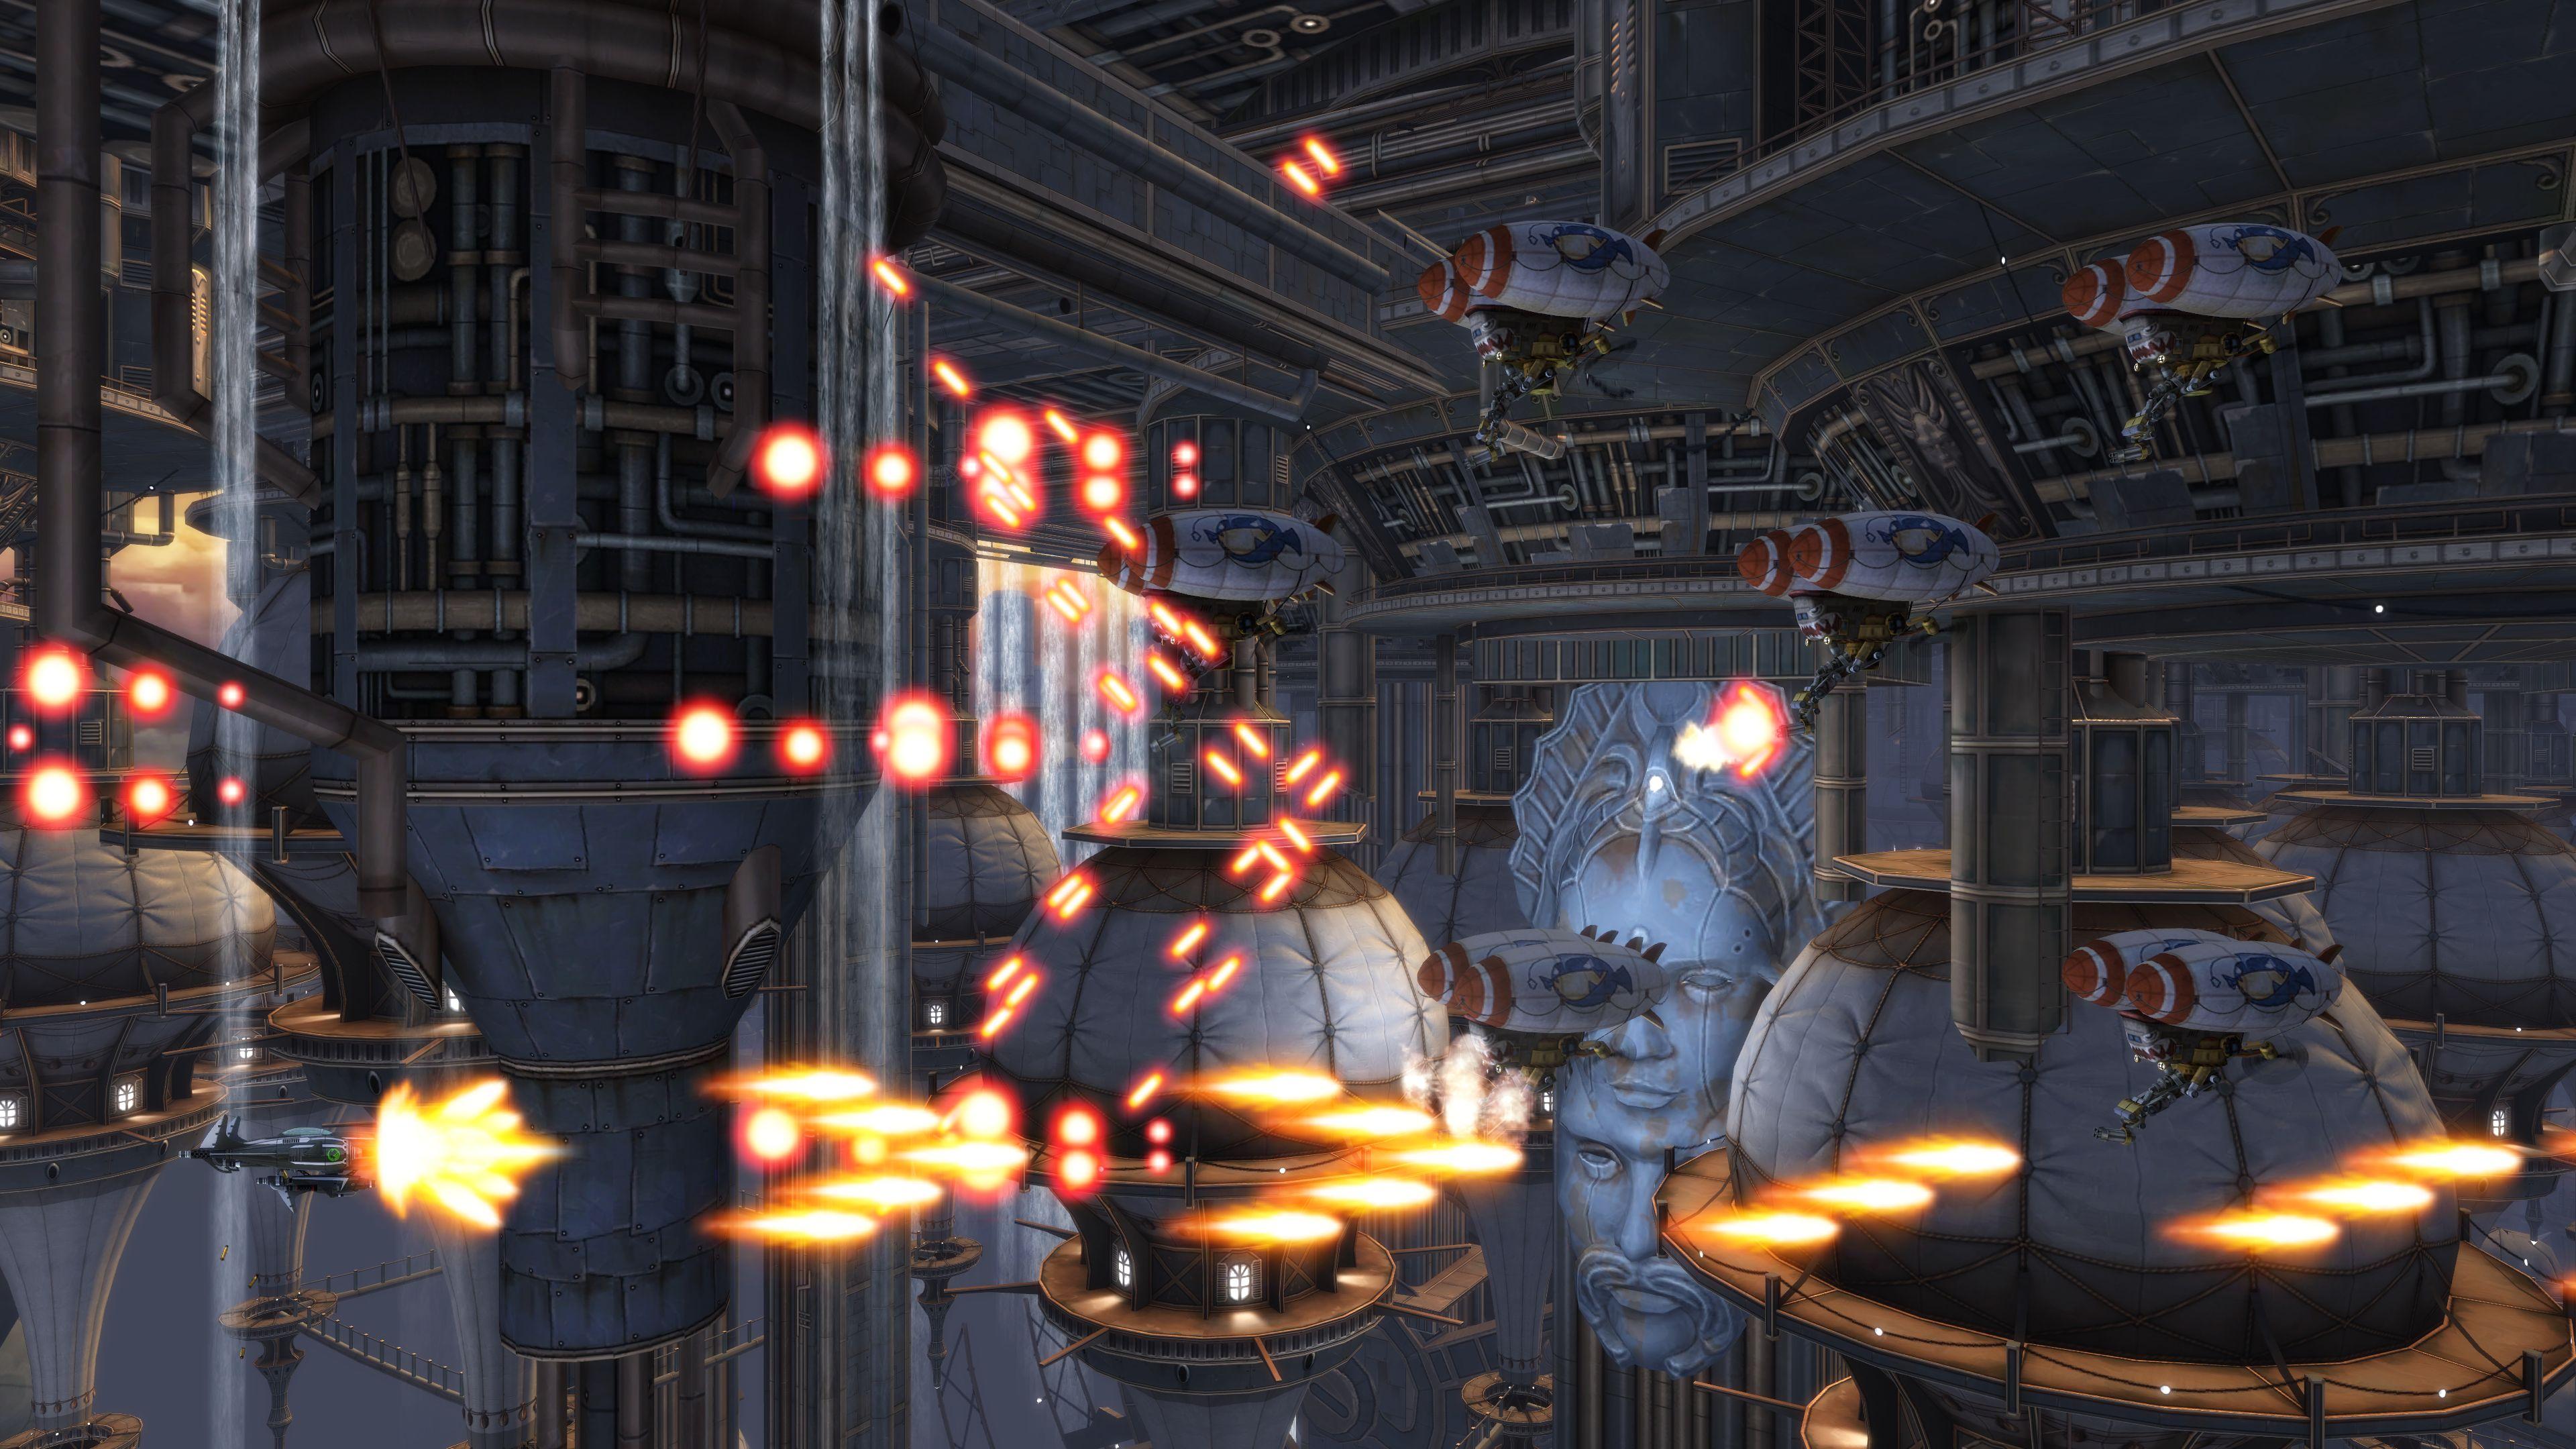 Hry pro Switch se rozrostou o Battle Chasers: Nightwar a Sine Mora EX 142172